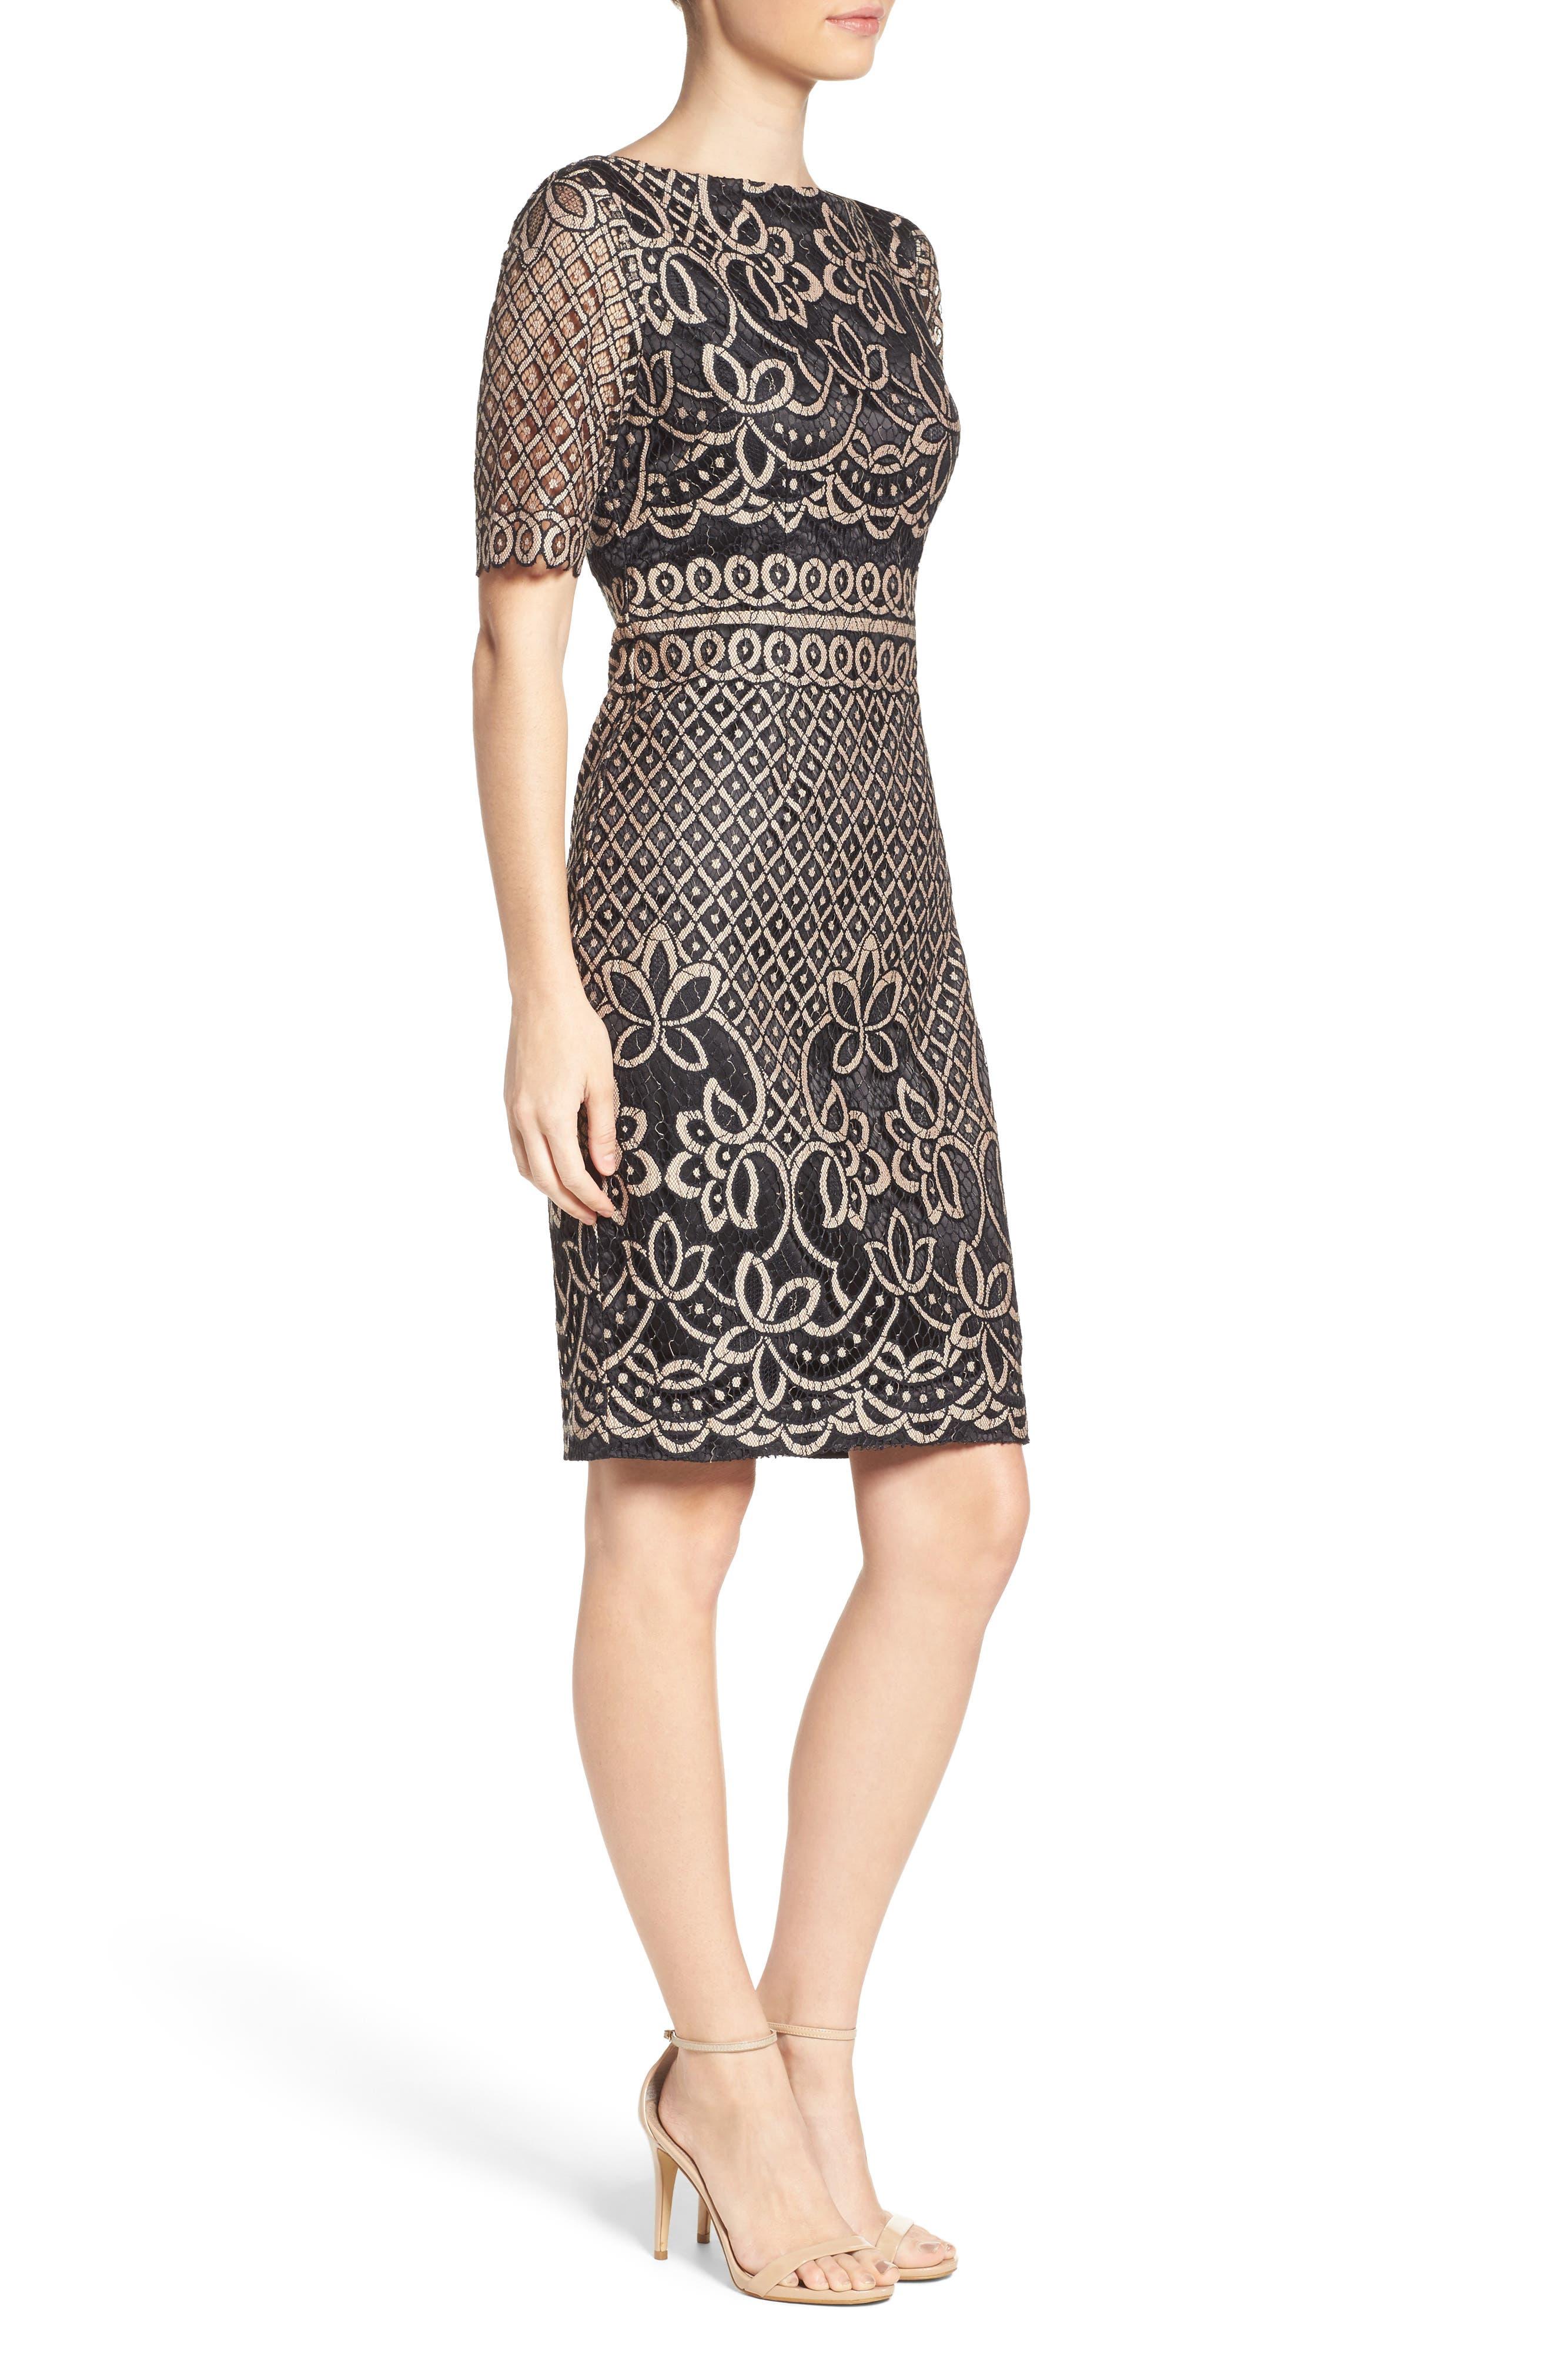 ELIZA J, Lace Sheath Dress, Alternate thumbnail 4, color, 009